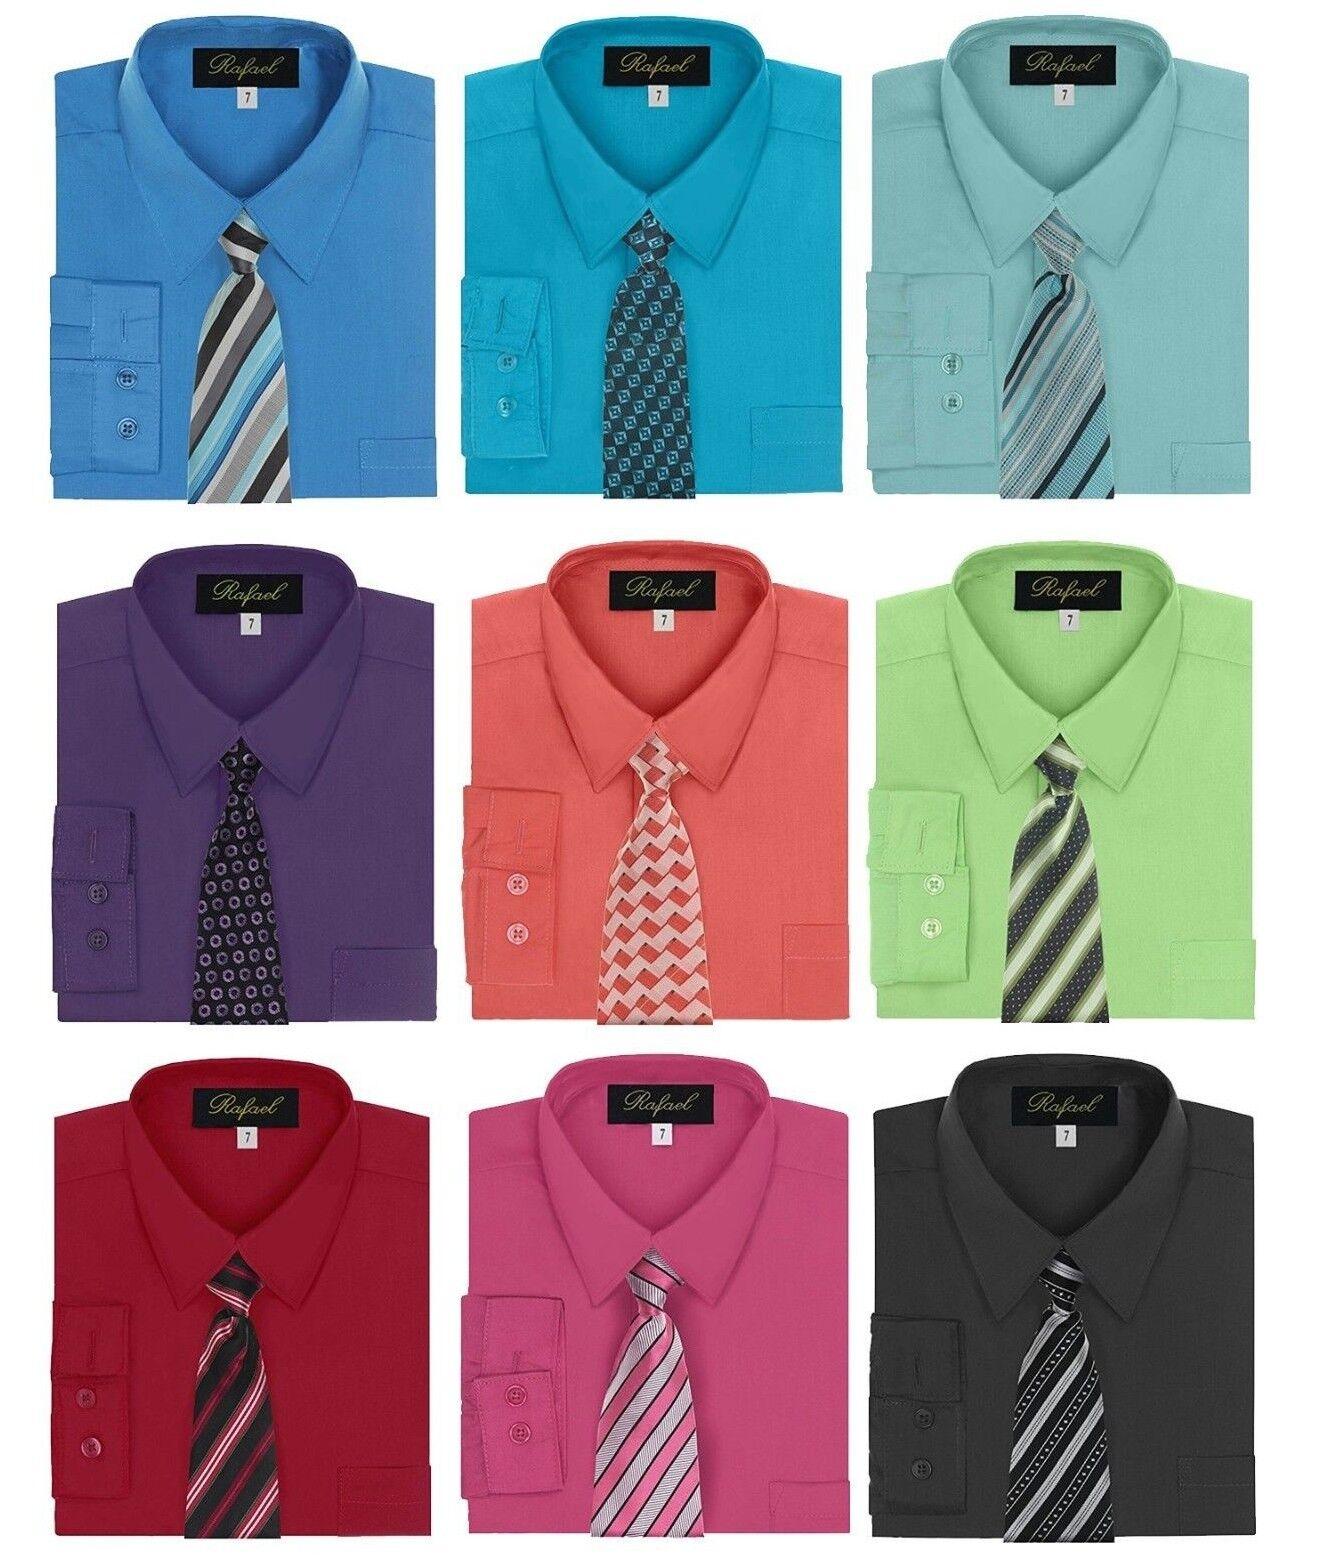 Boy's Dress Shirt & Tie Set Long Sleeve- Many Colors Availab